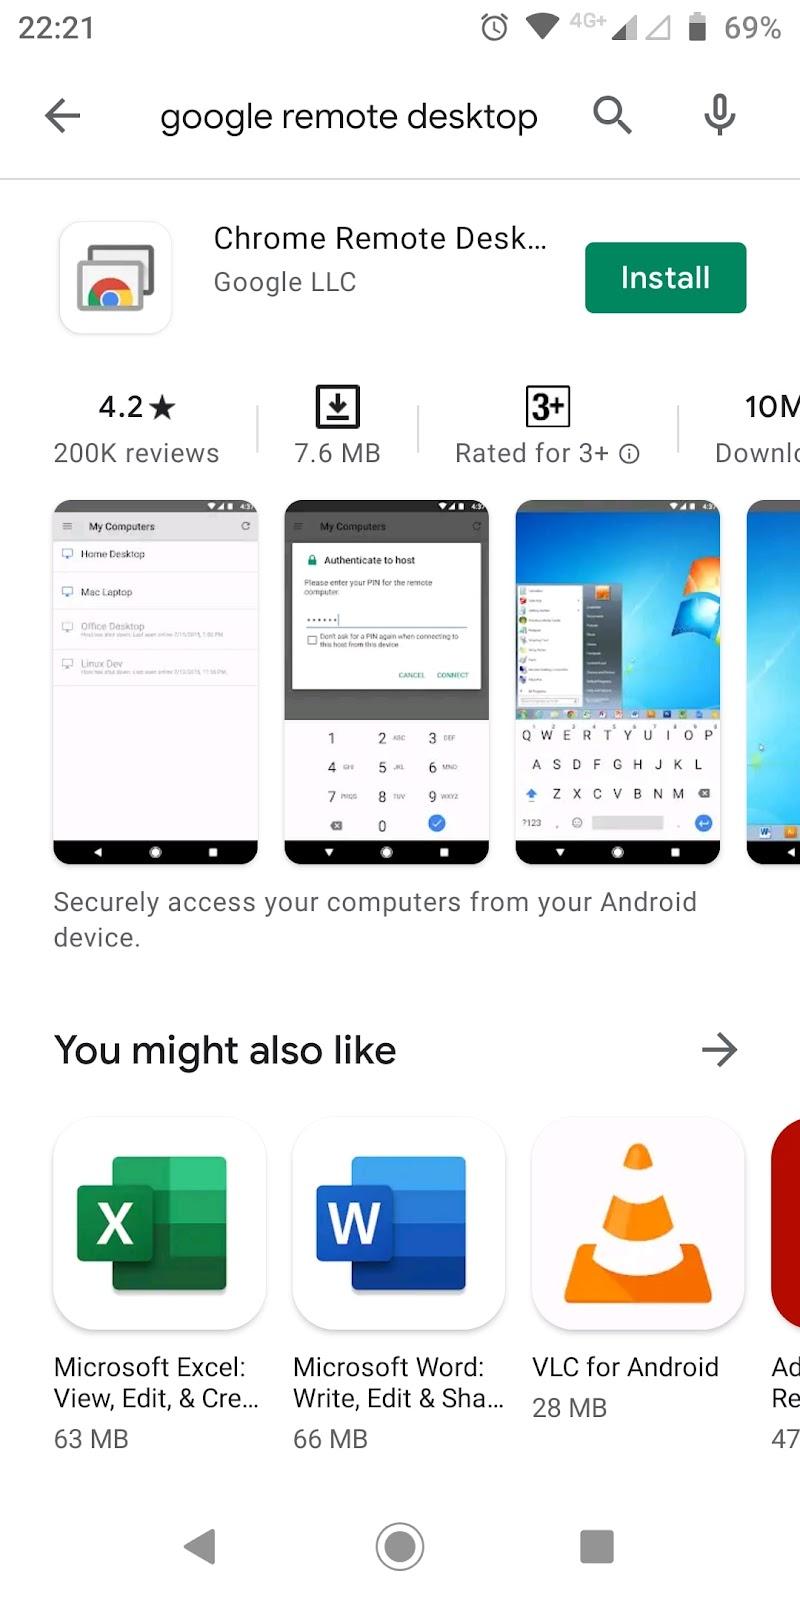 Google remote desktop